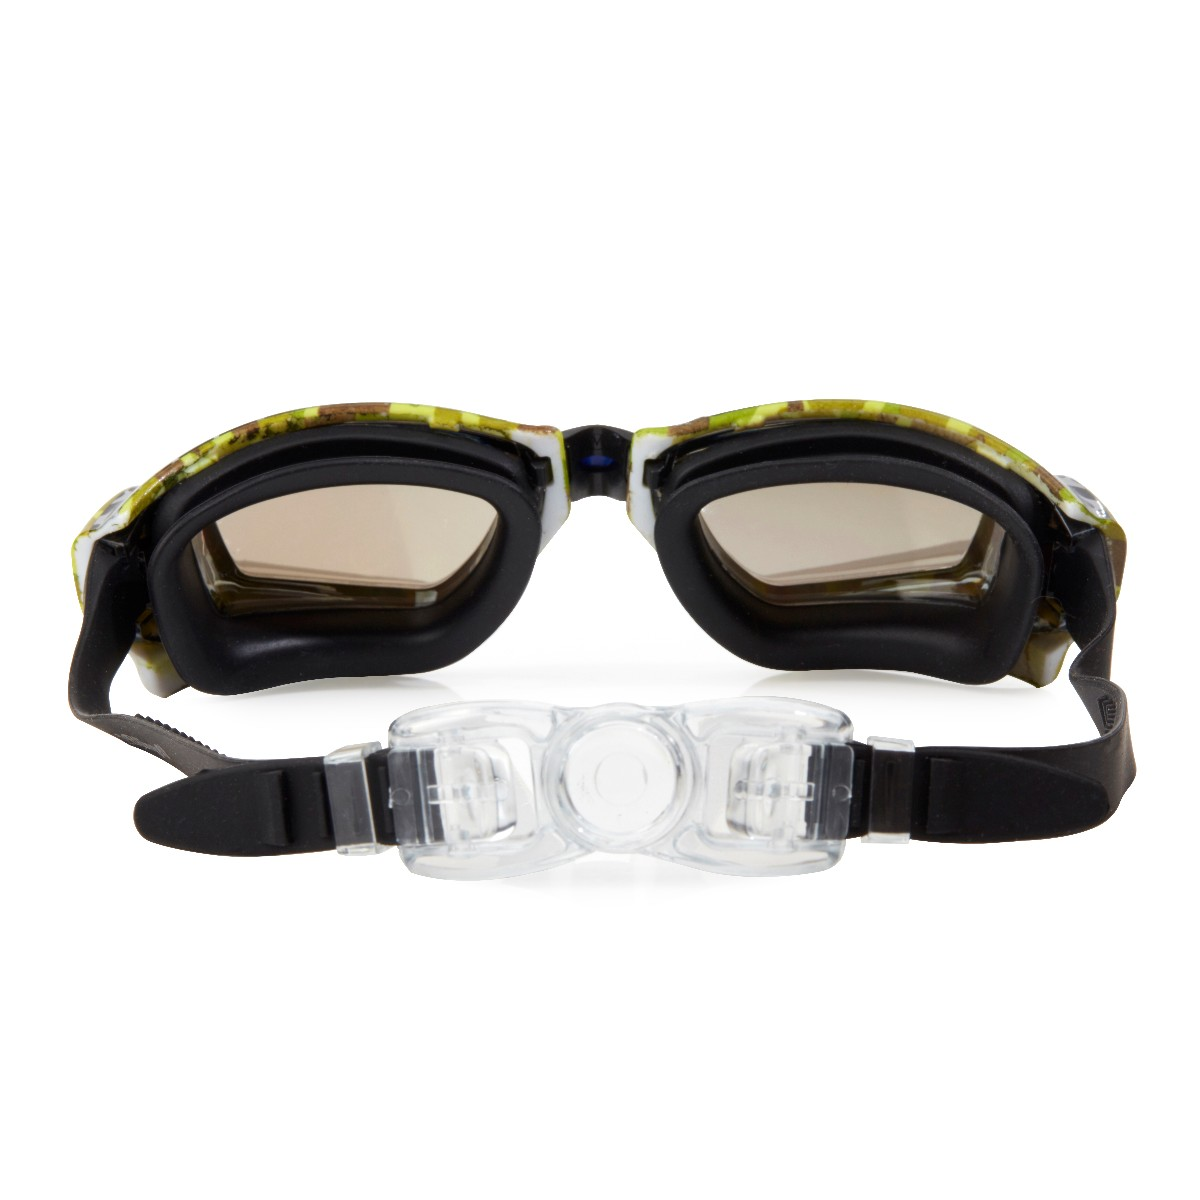 Svømmebrille, Camoflage